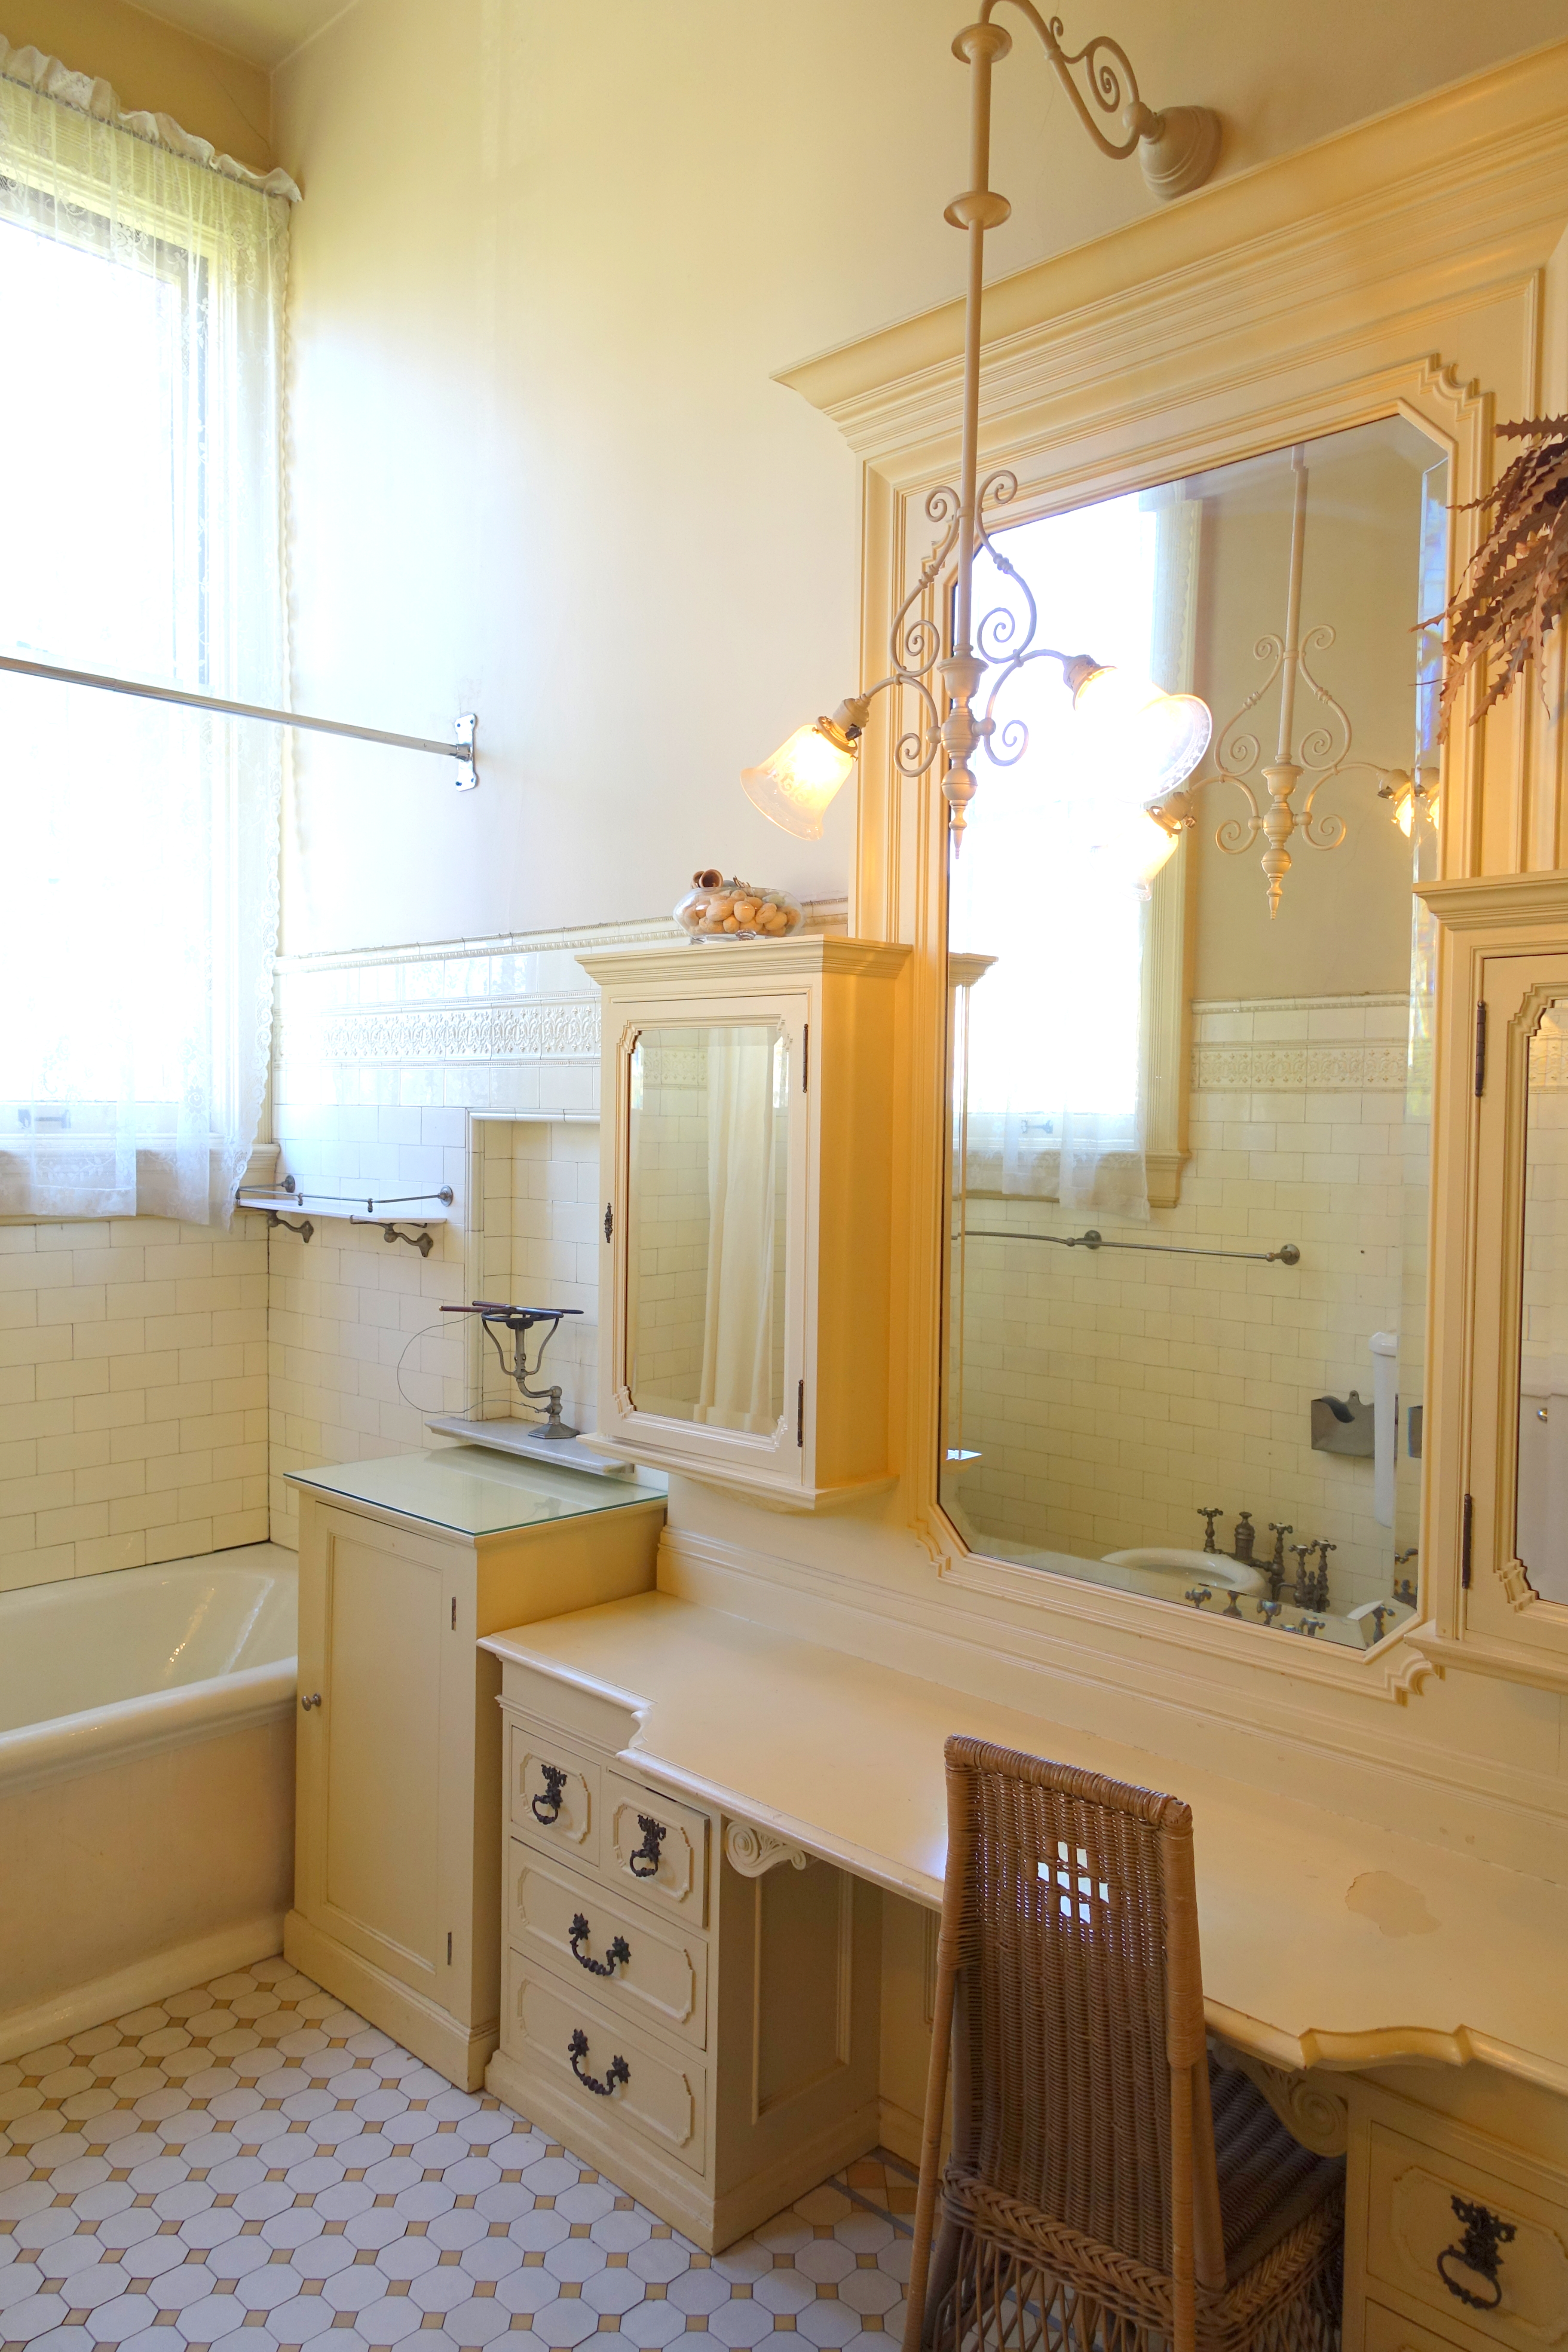 File:bathroom  Haaslilienthal House  San Francisco, Ca  Dsc05075